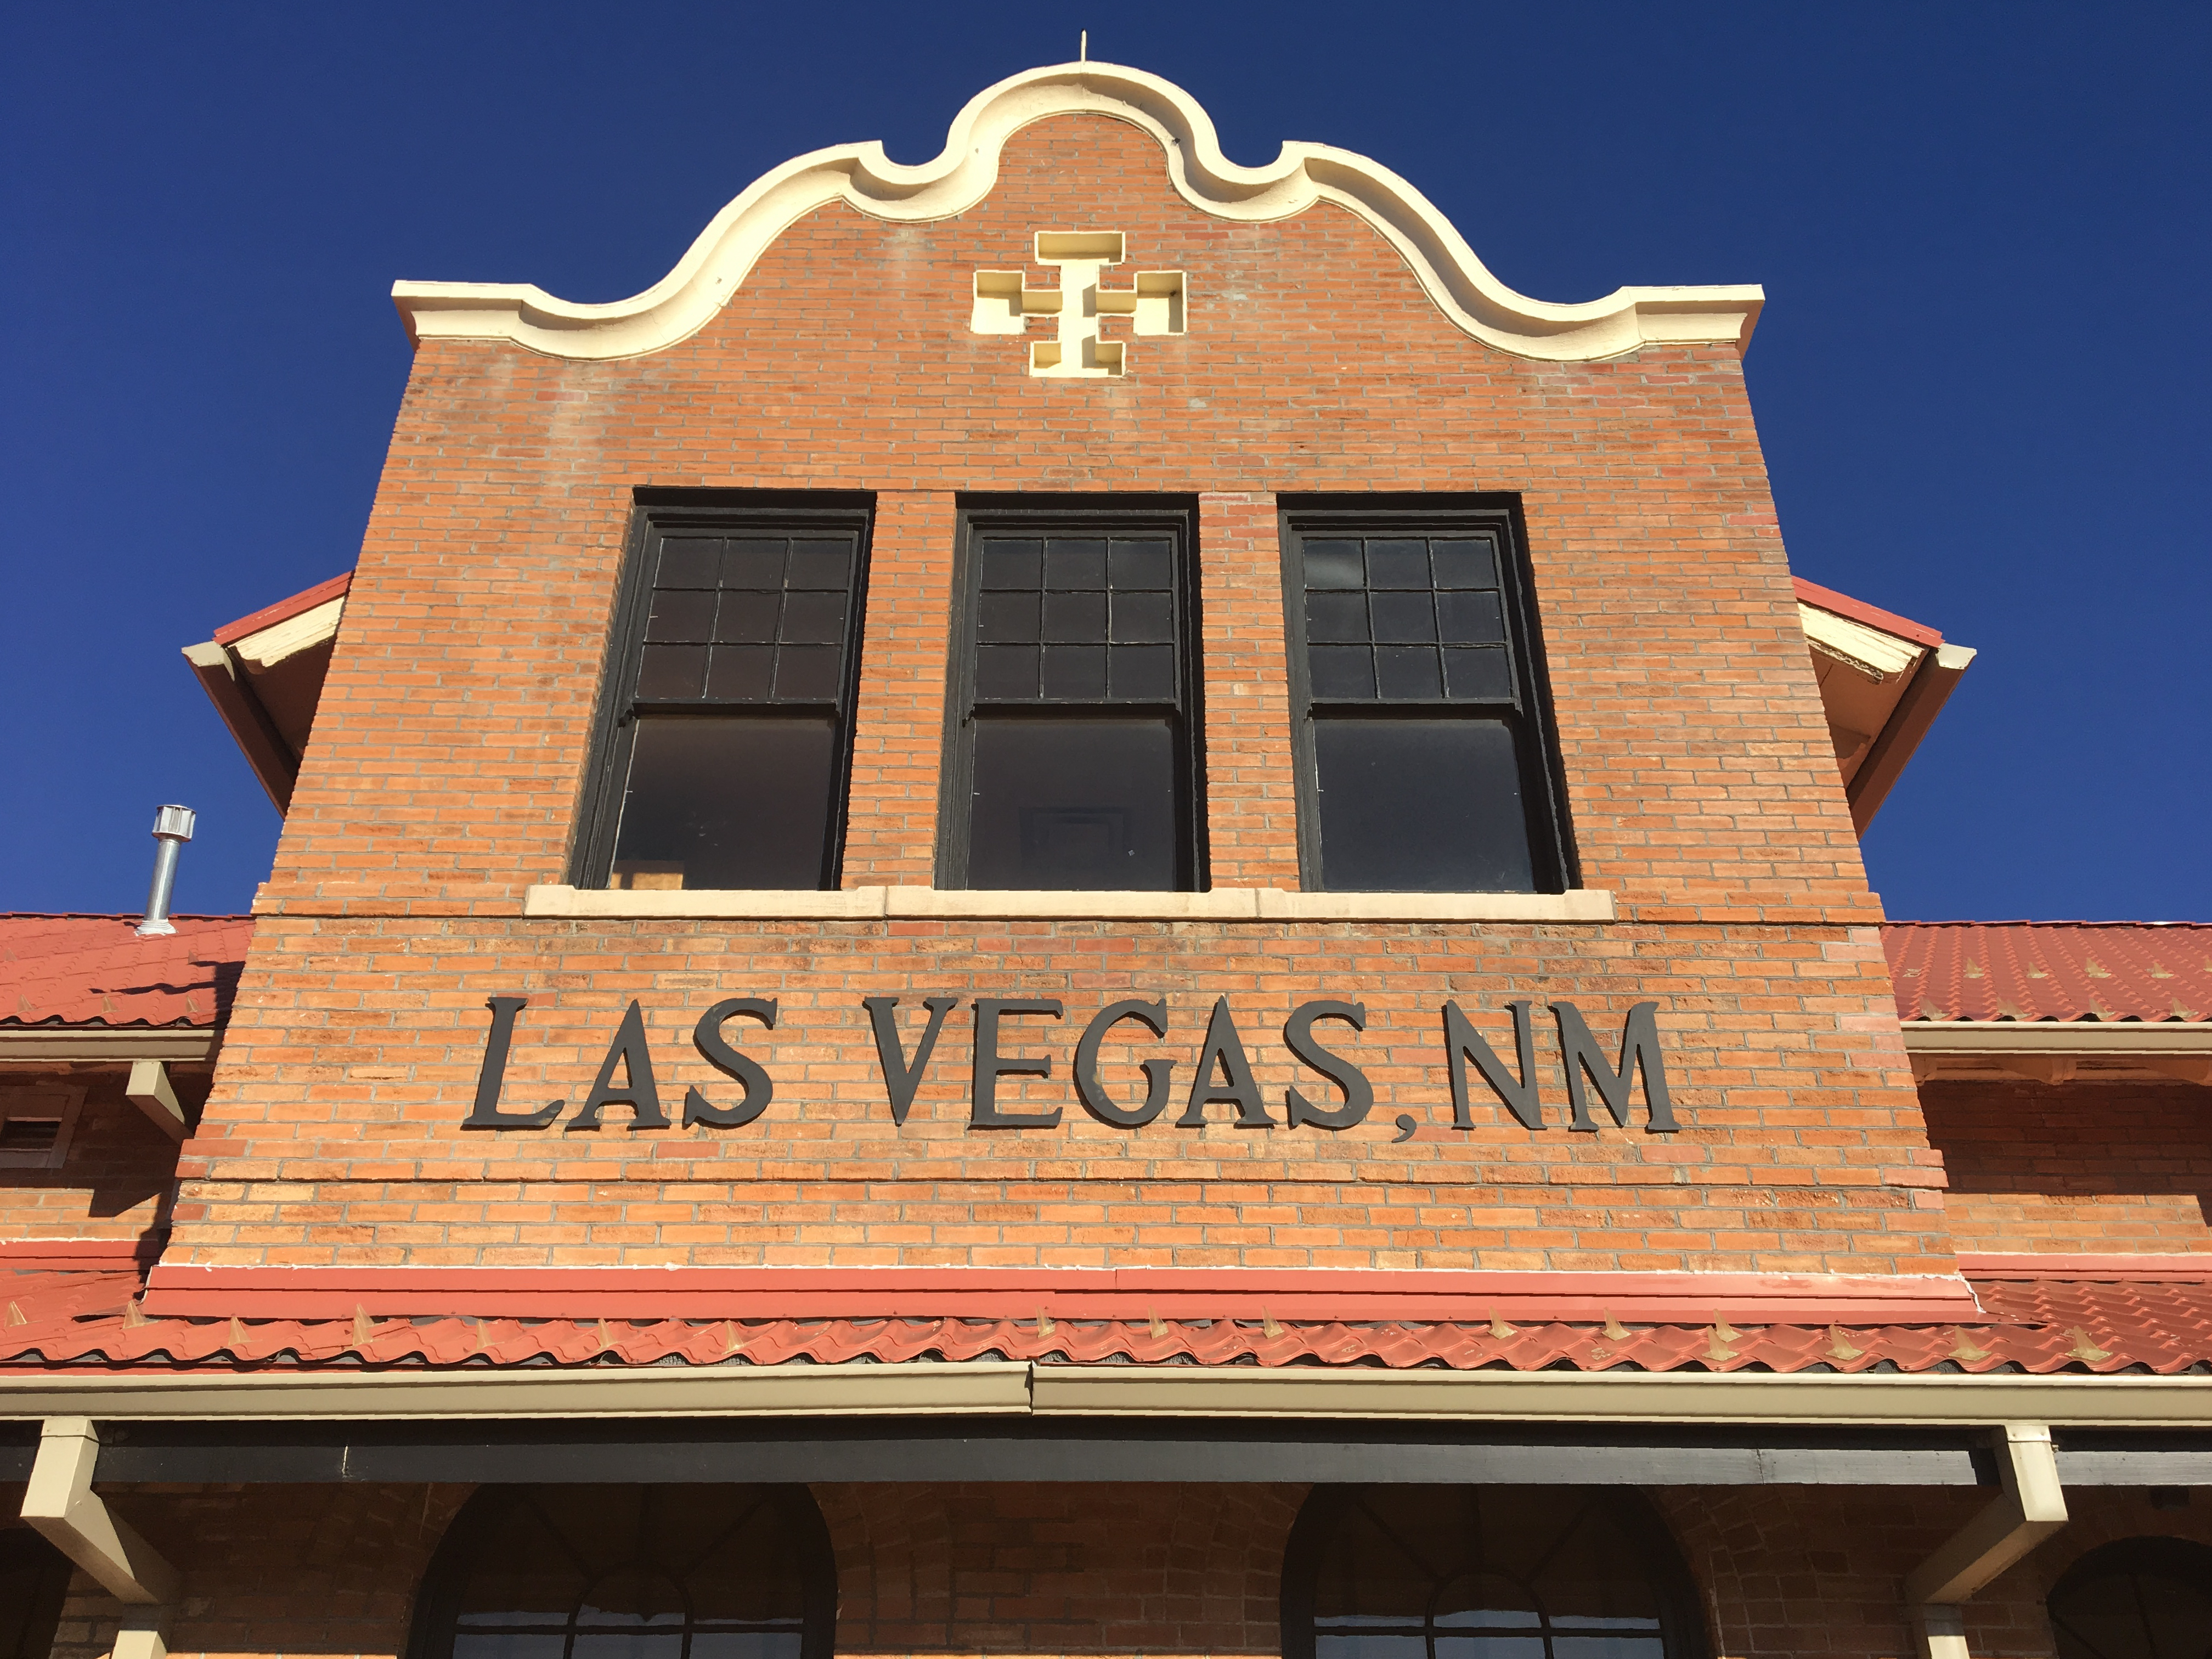 Las Vegas, NM